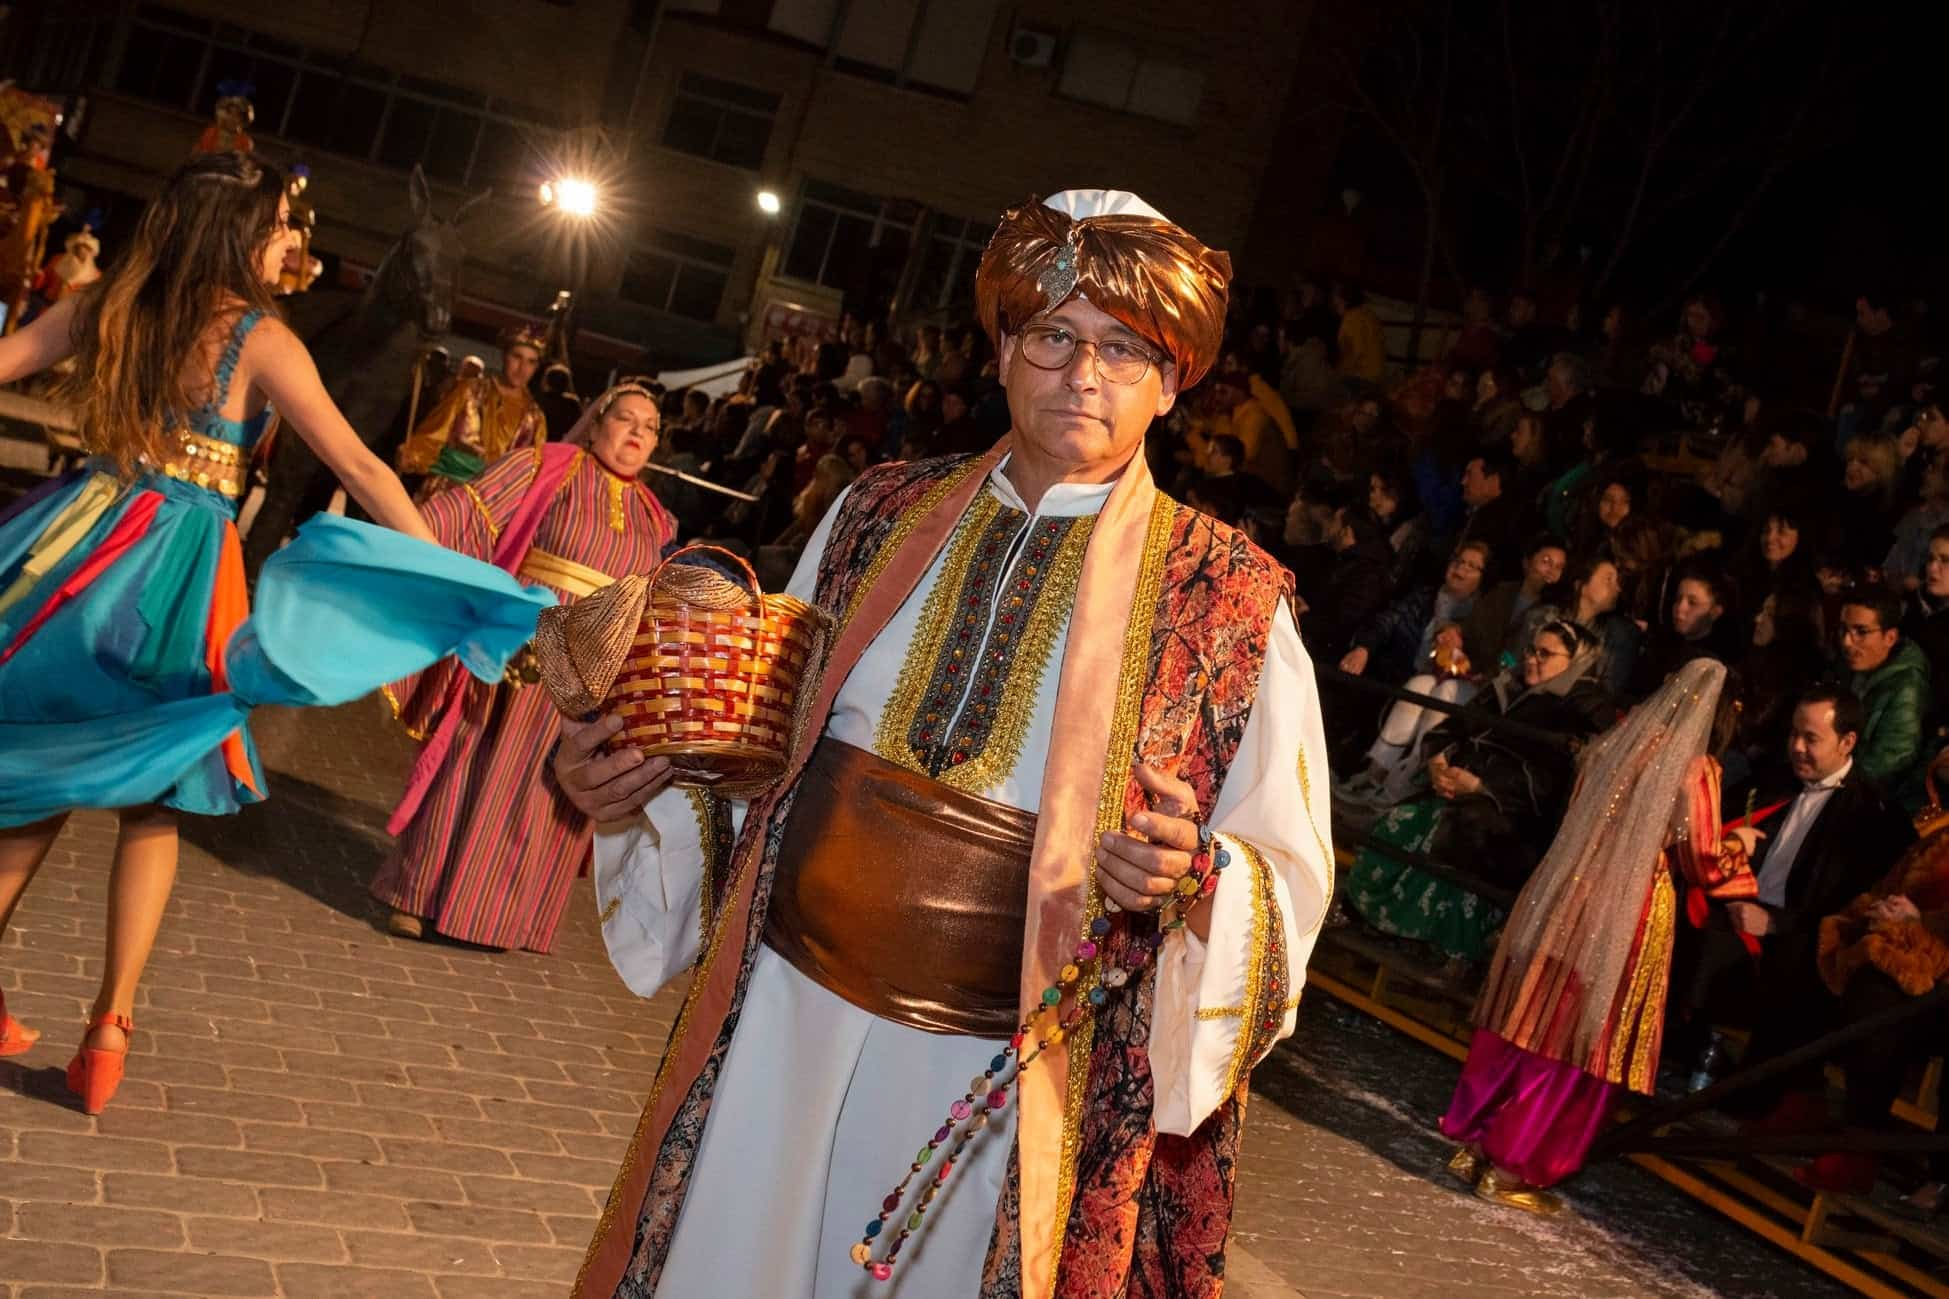 Carnaval de herencia 2020 ofertorio 30 - Selección de fotografías del Ofertorio del Carnaval de Herencia